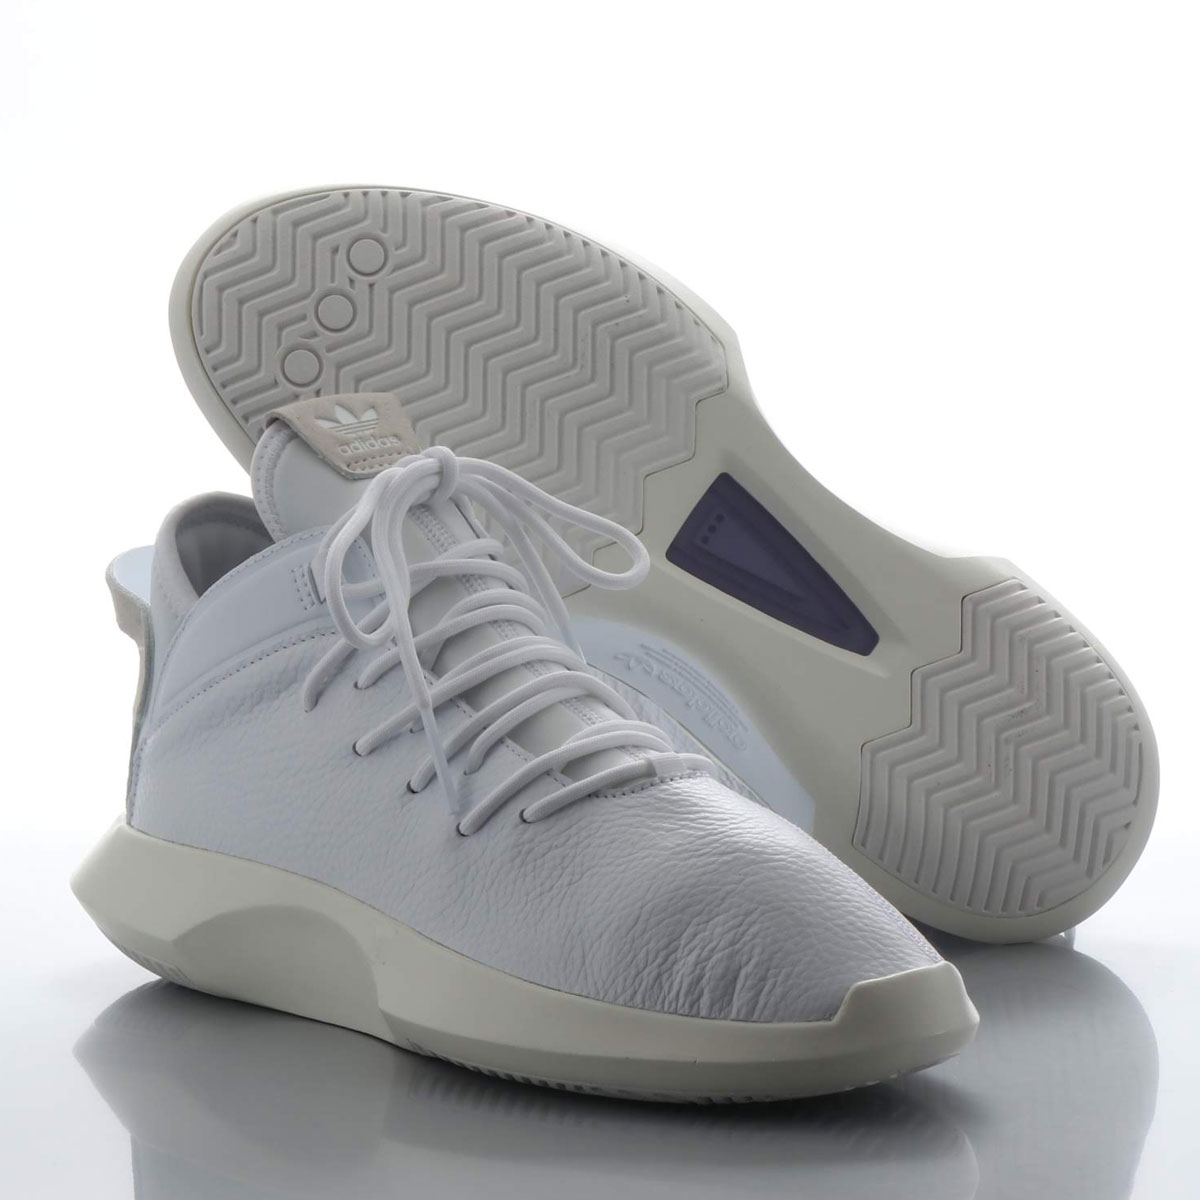 adidas Originals CRAZY 1 ADV(アディダスオリジナルス クレイジー 1 ADV)RUNNING WHITE/RUNNING WHITE/SUPPLIER COLOR【メンズ レディース スニーカー】19SS-I